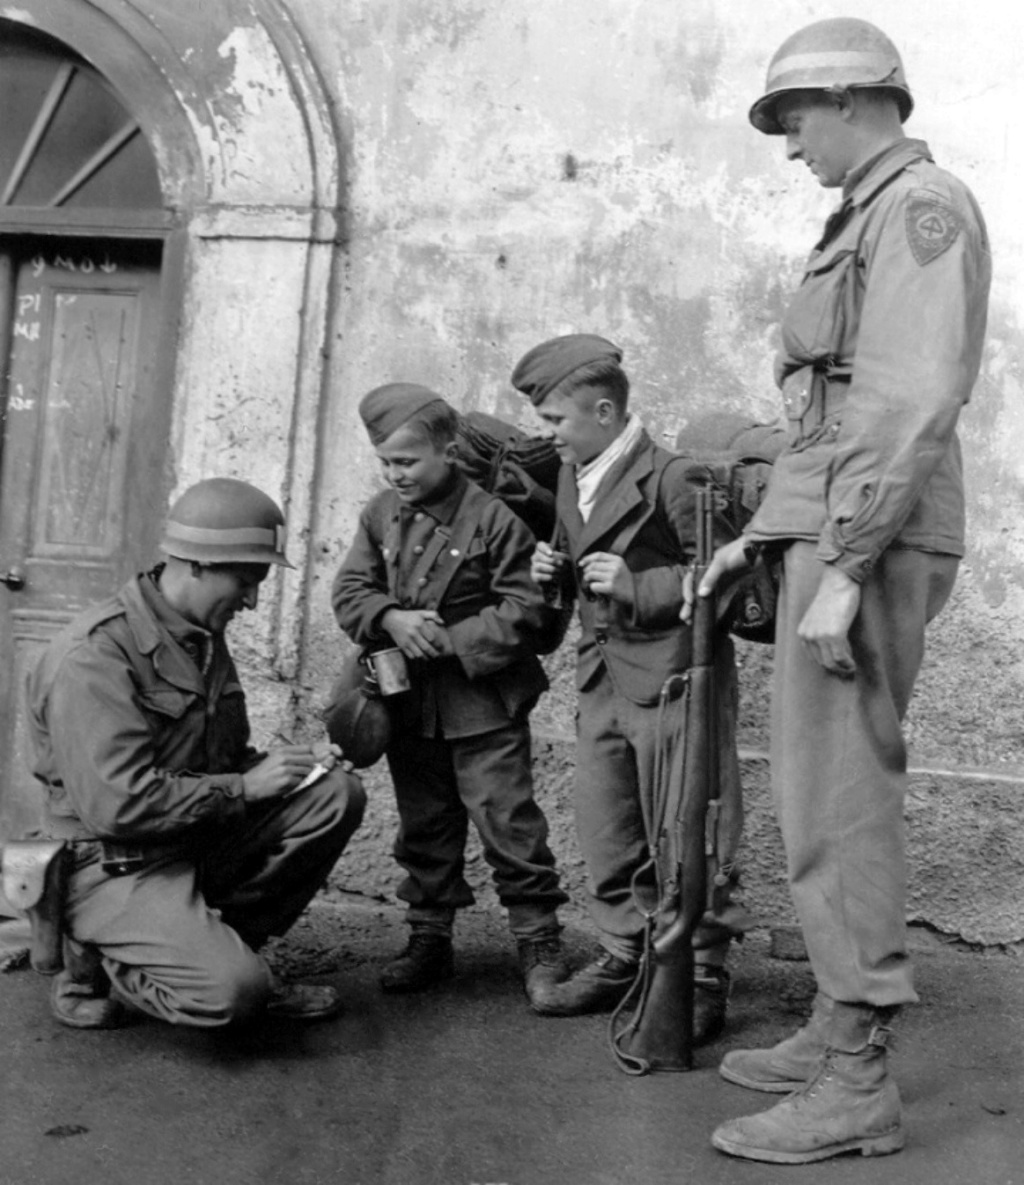 Diverses photos de la WWII - Page 40 2057